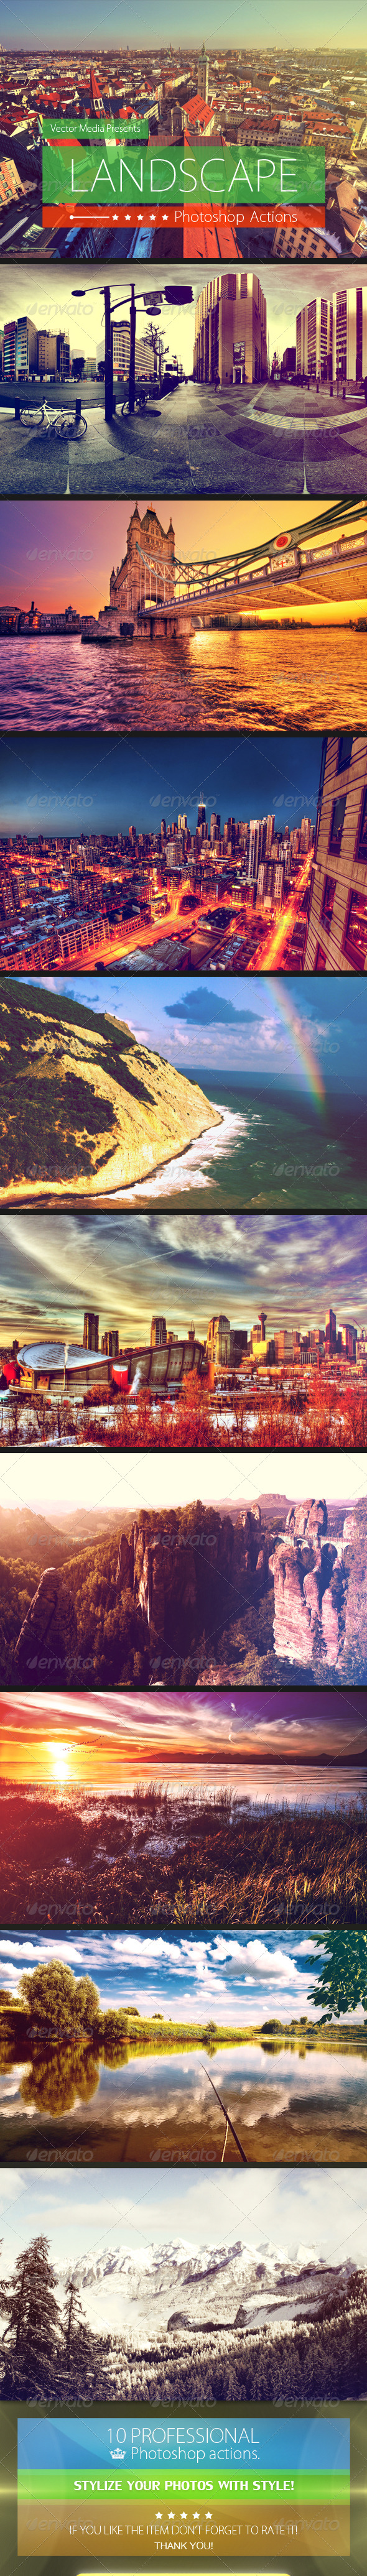 Landscape - Photoshop Actions - Photo Effects Actions